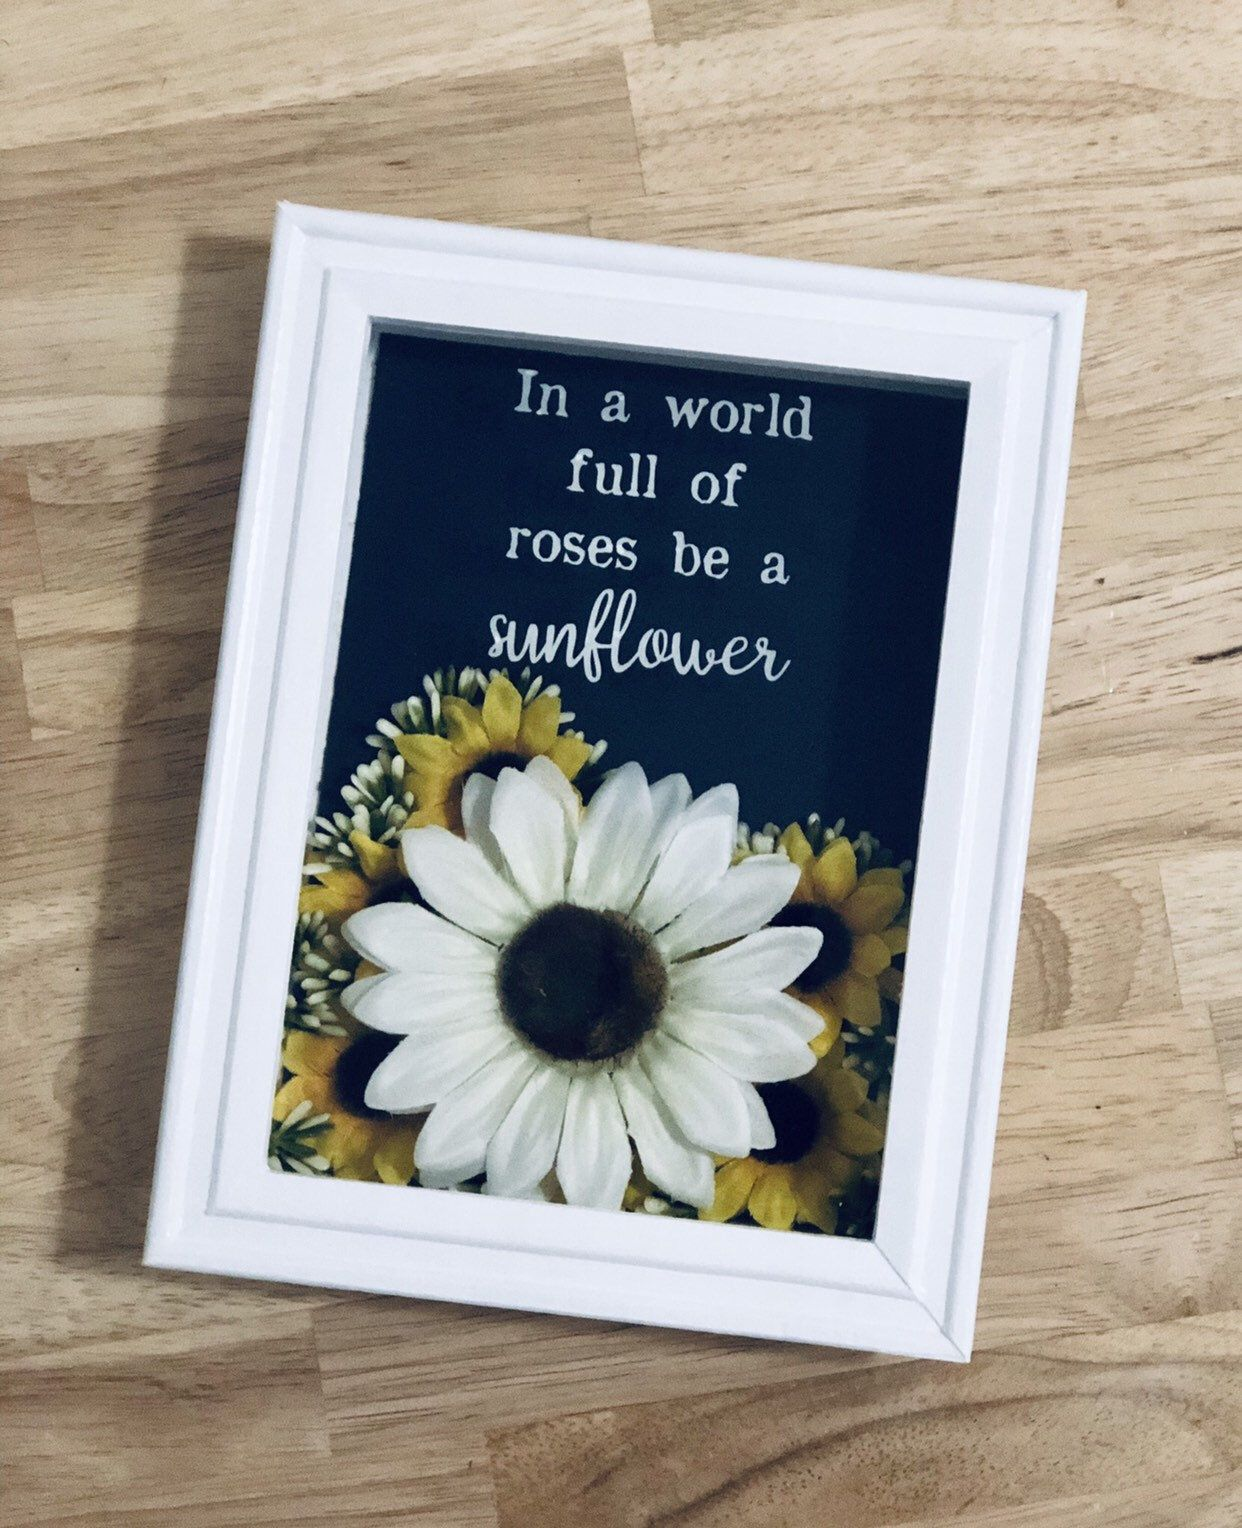 Floral Shadowbox: Home Decor-Wall Decor-Quotes